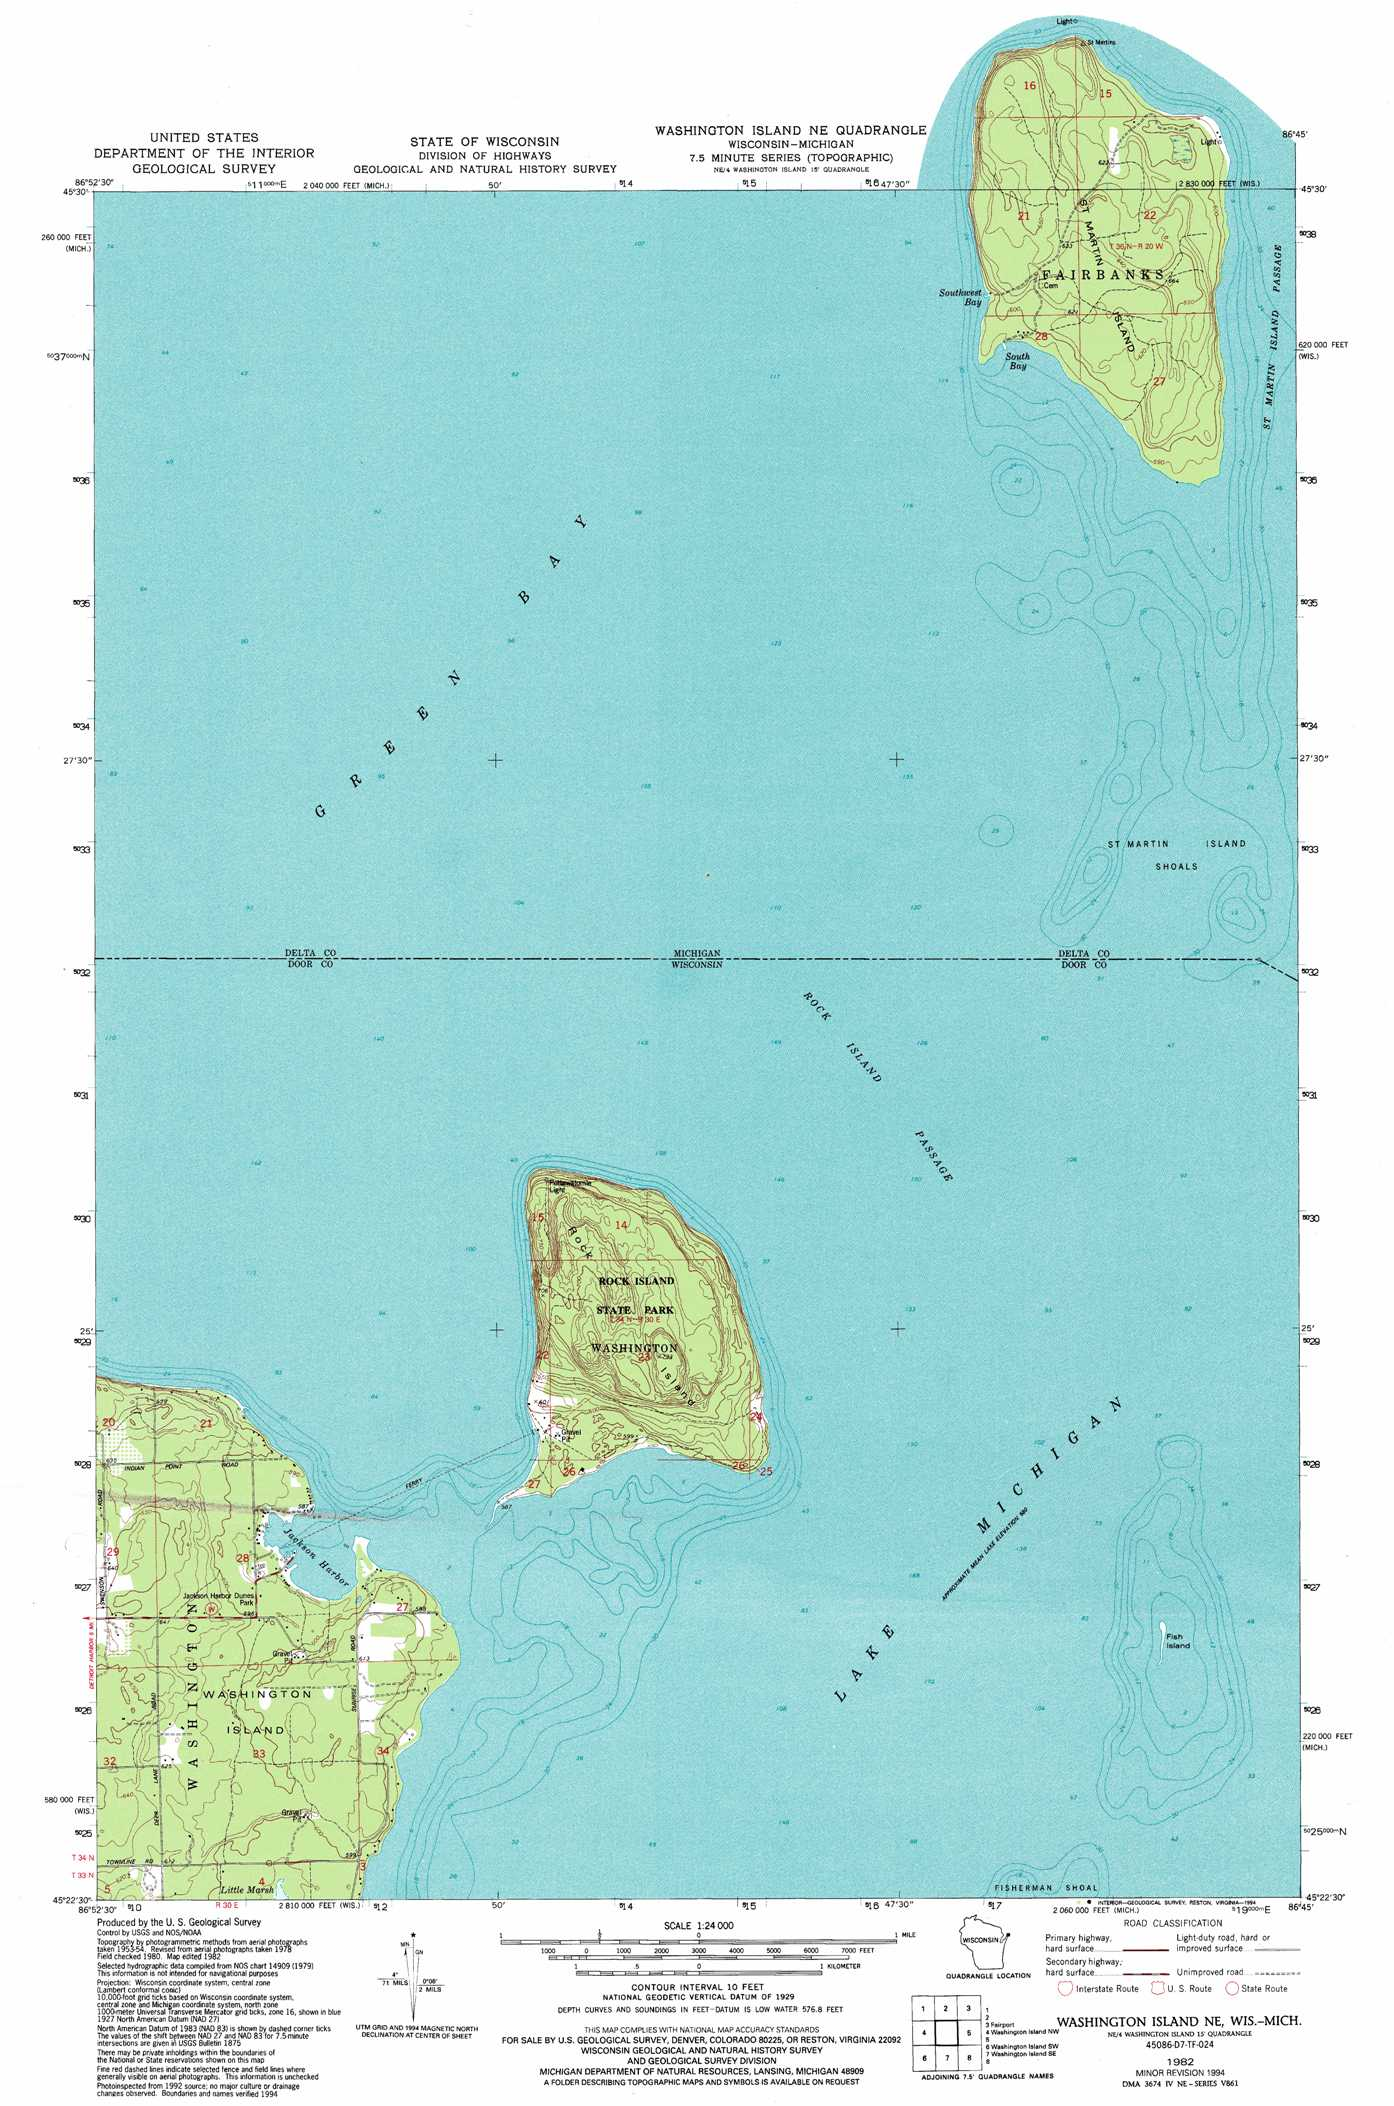 Washington Island Nw Topographic Map WI MI  USGS Topo